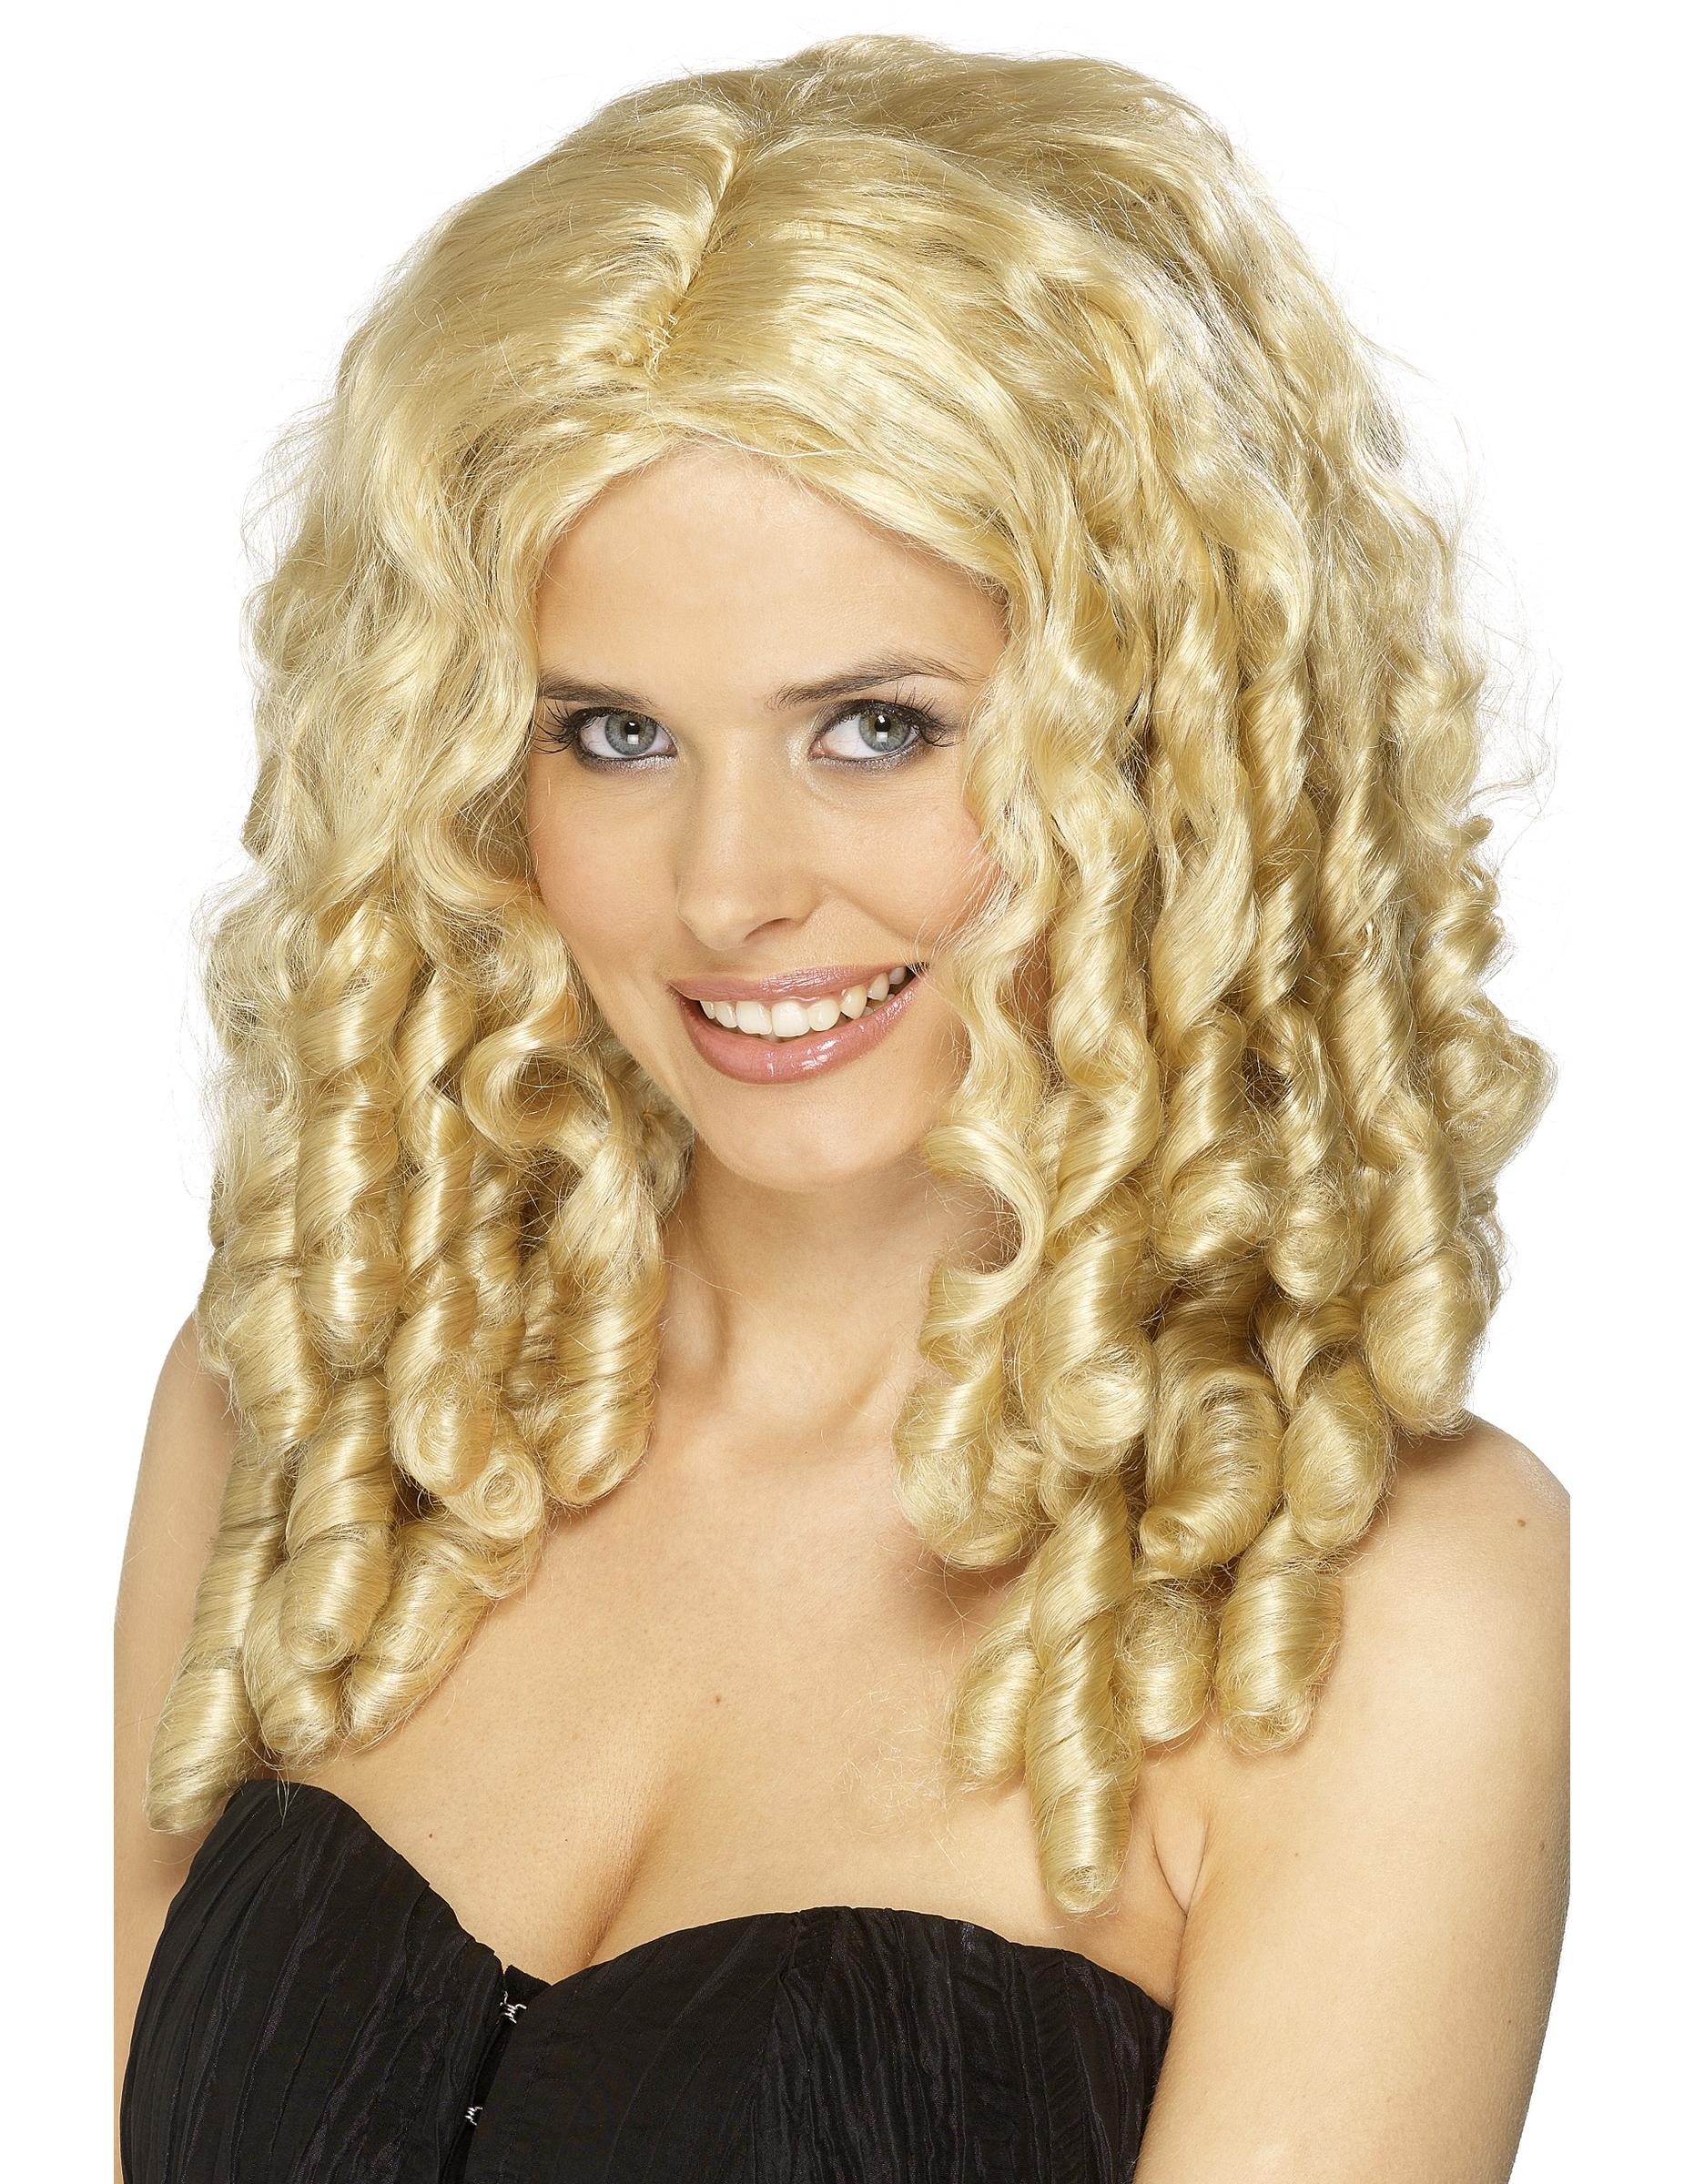 Blonde Wig For Superstar Women Wigs And Fancy Dress